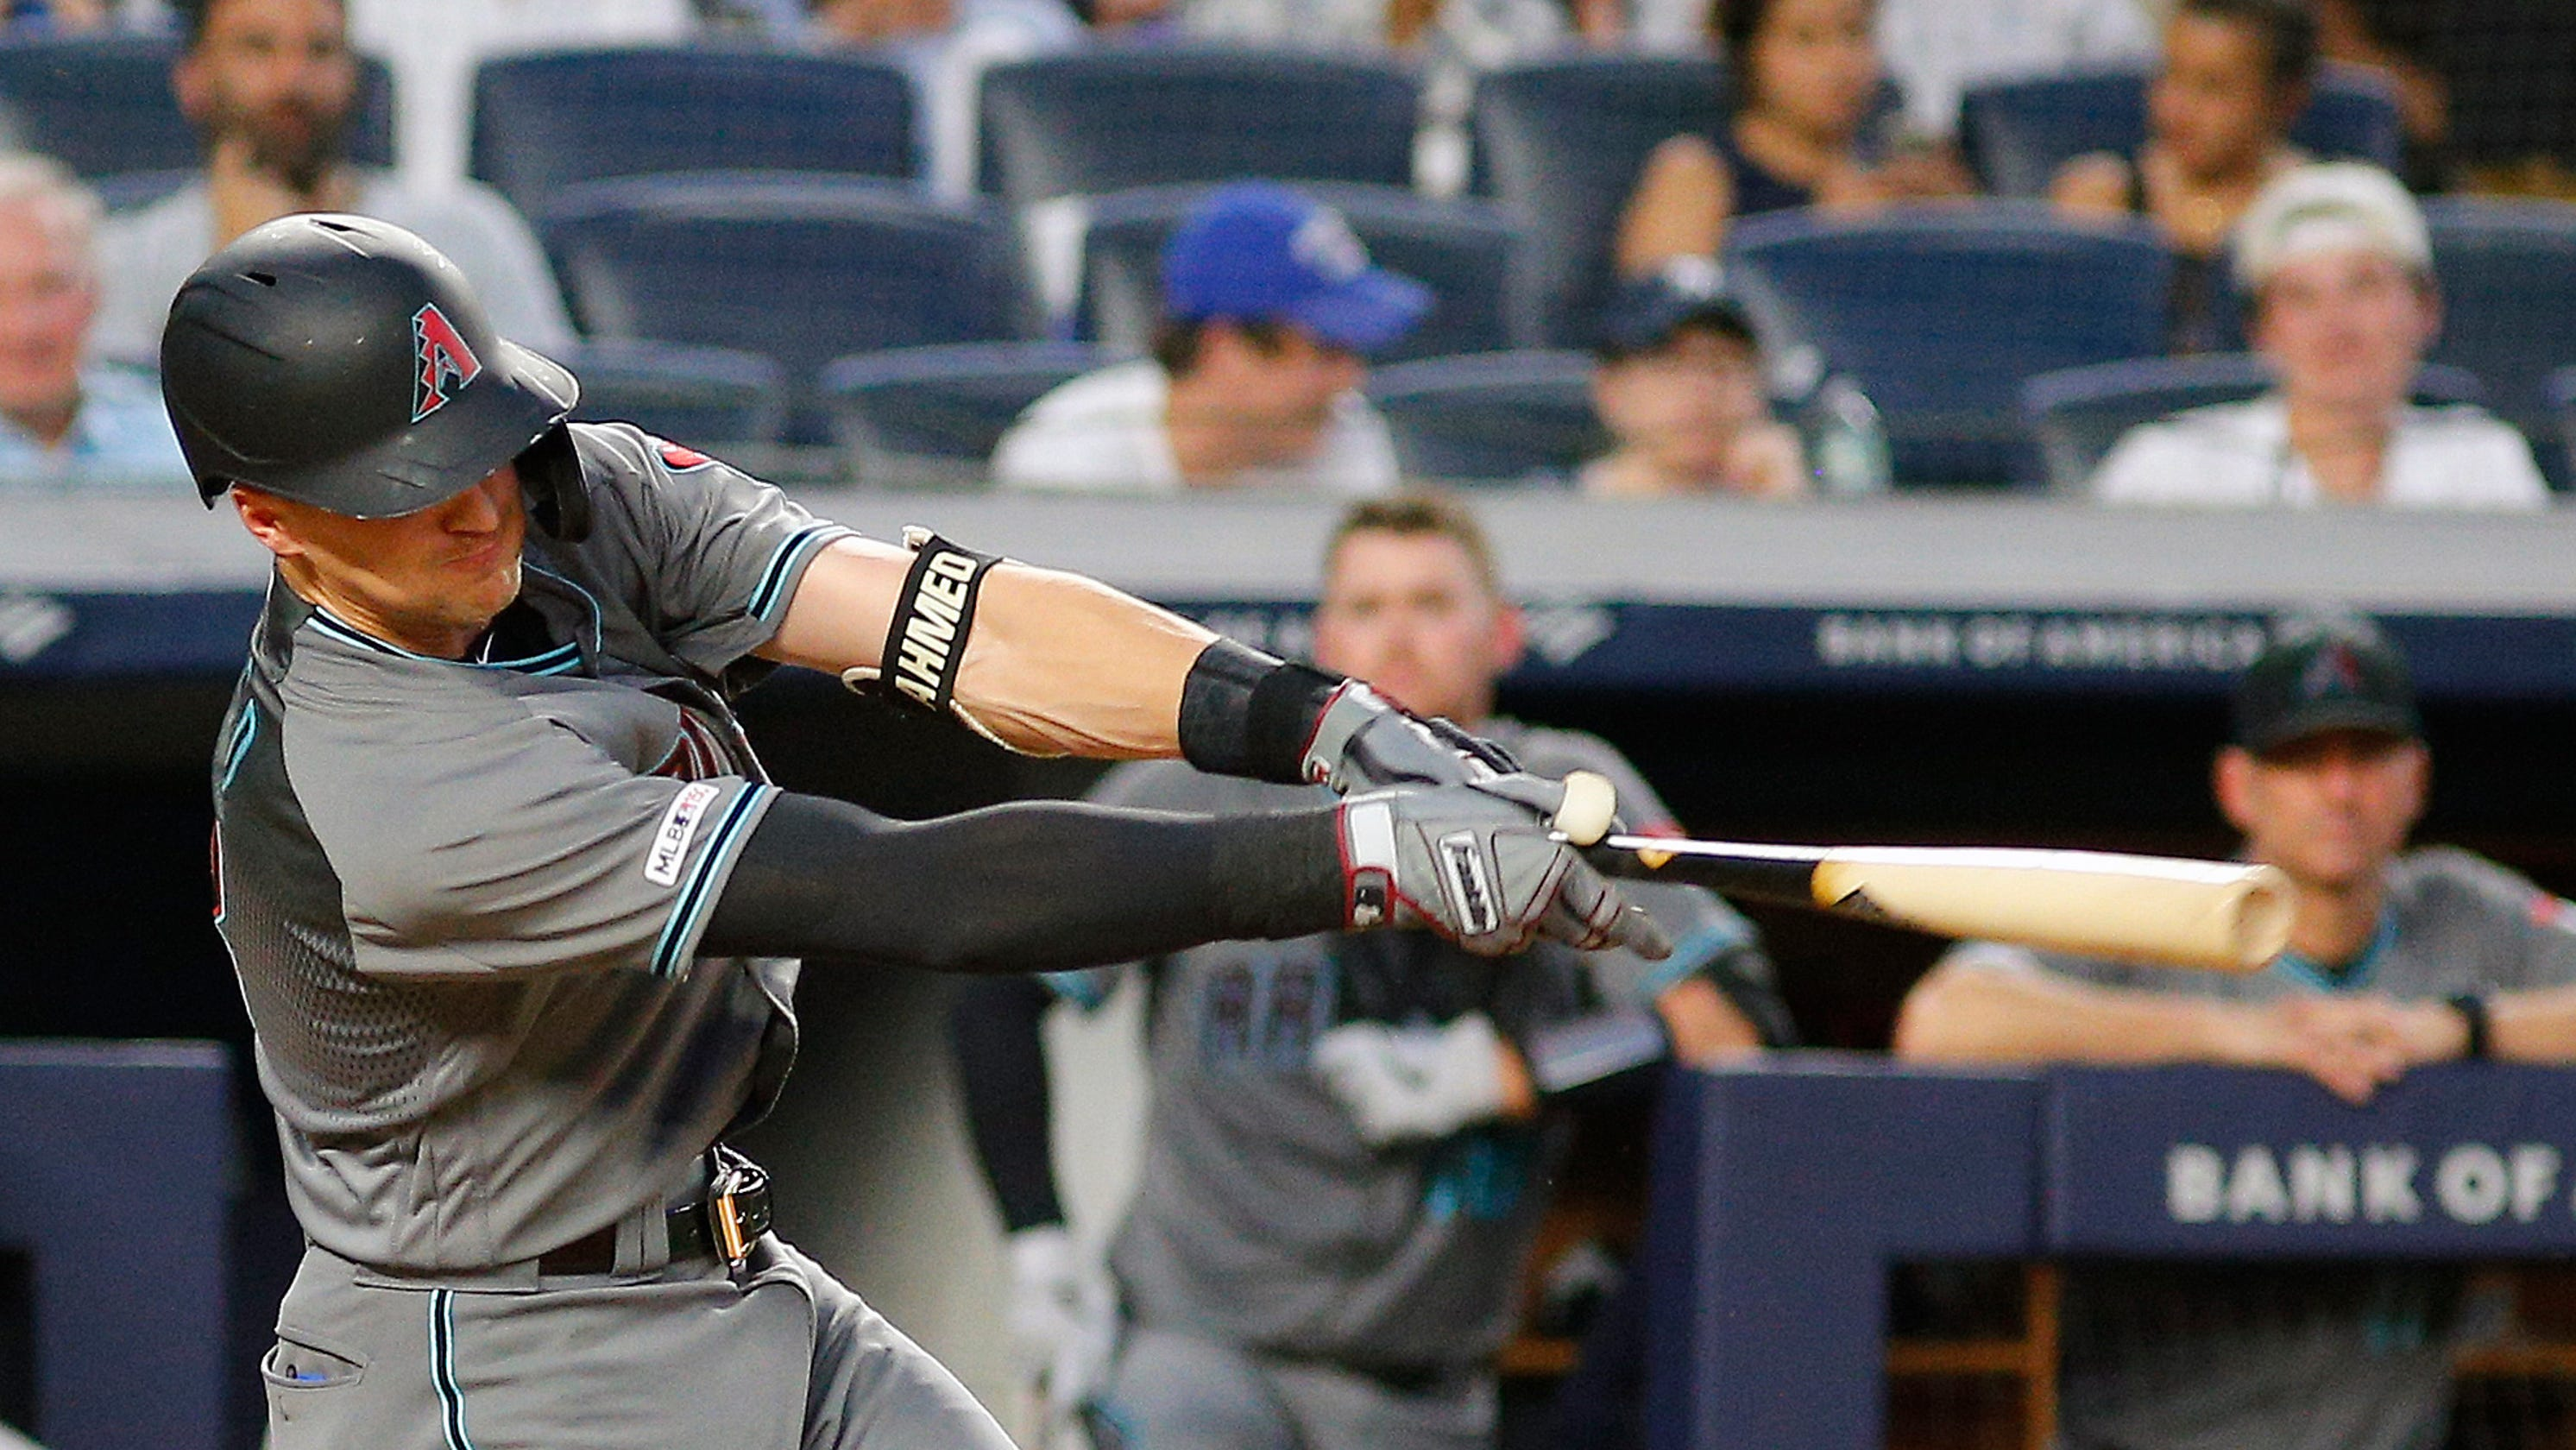 Arizona Diamondbacks' Nick Ahmed part of MLB's shortstop revolution